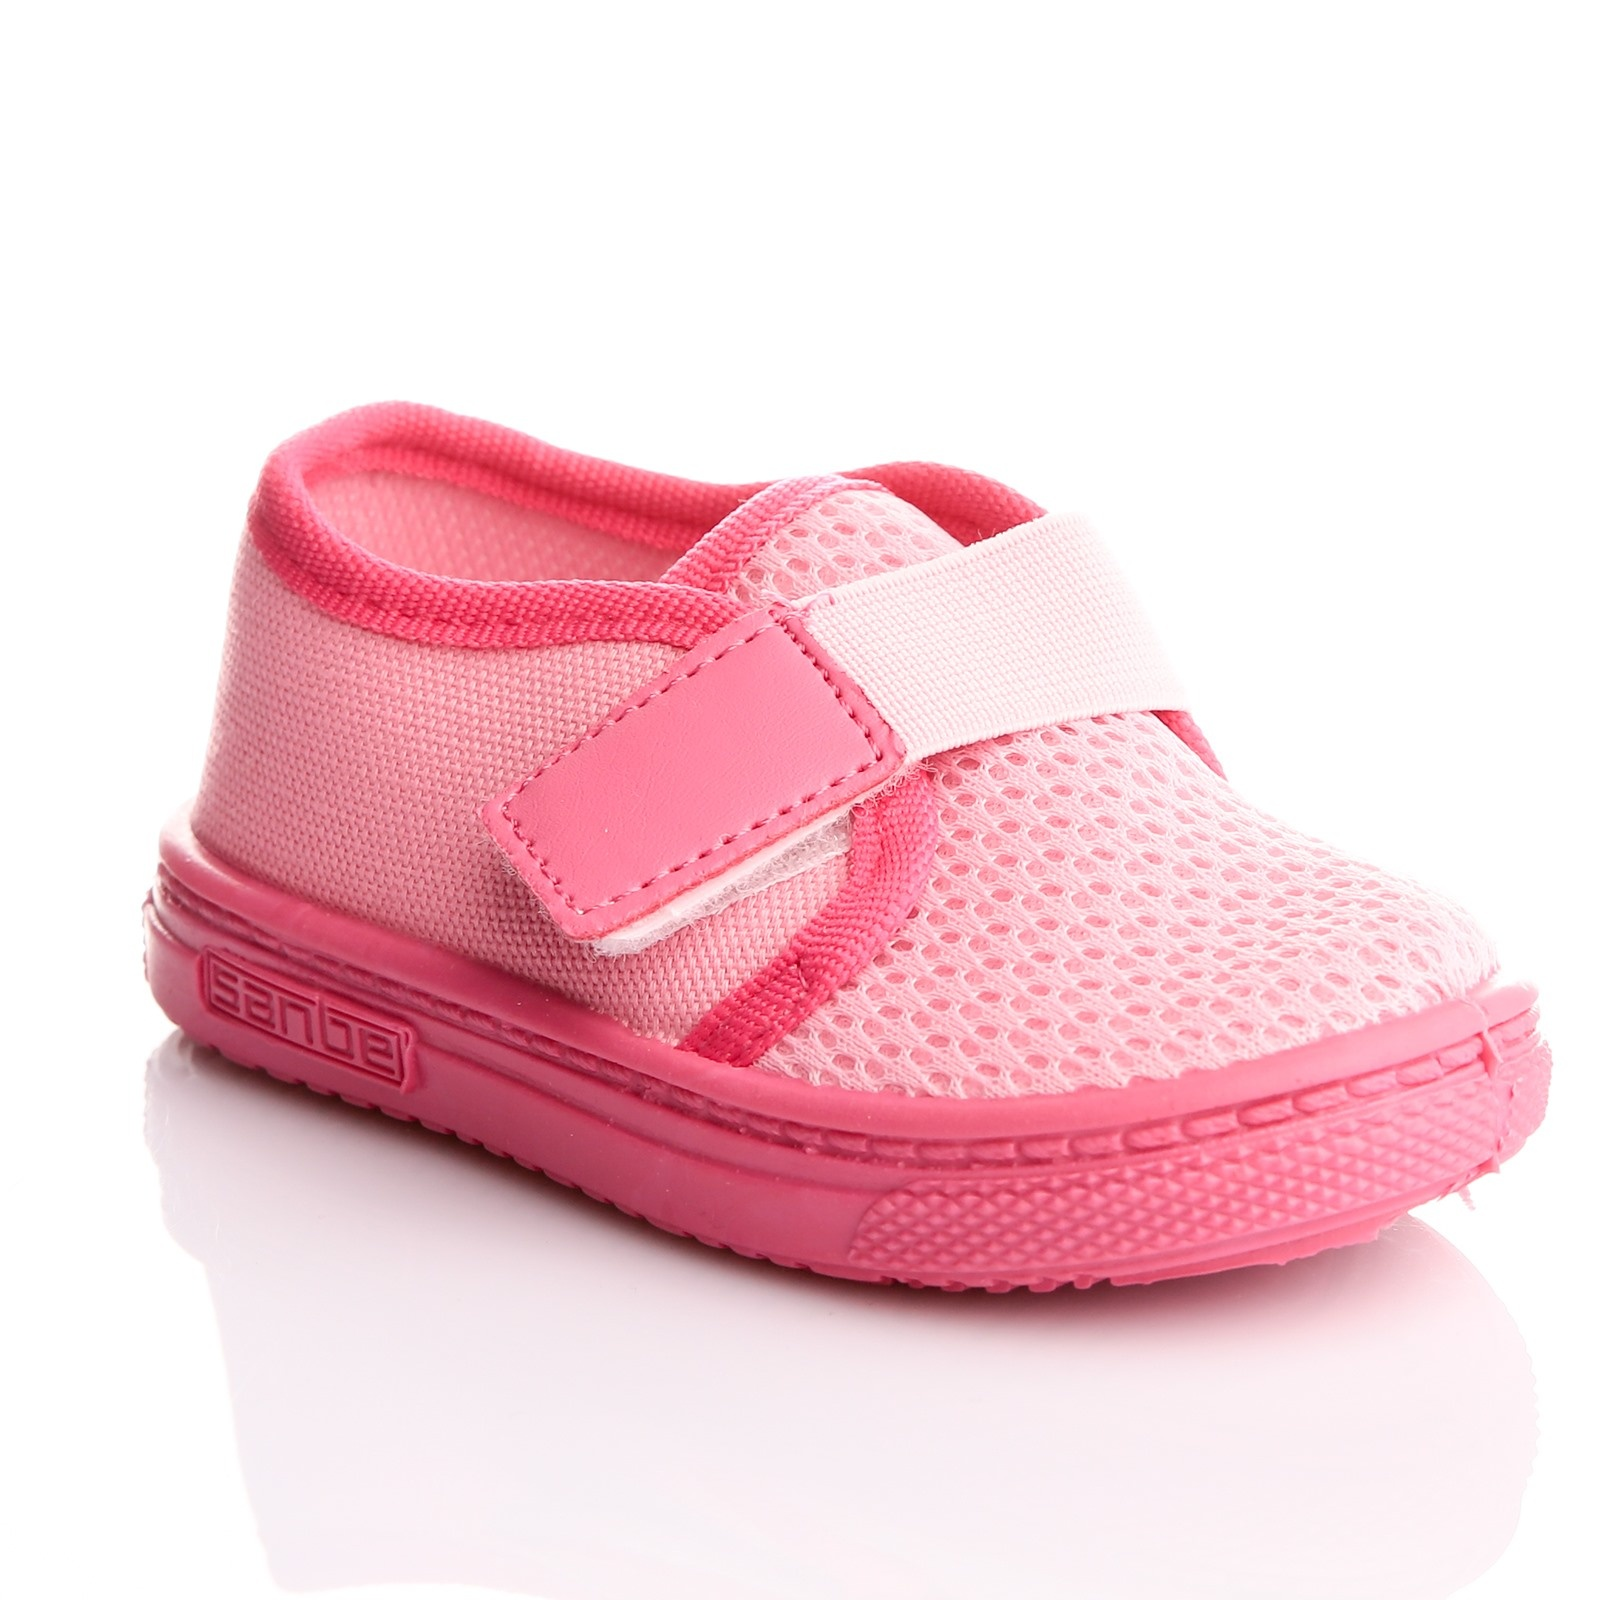 Ebebek Sanbe Summer Baby Linen Shoes